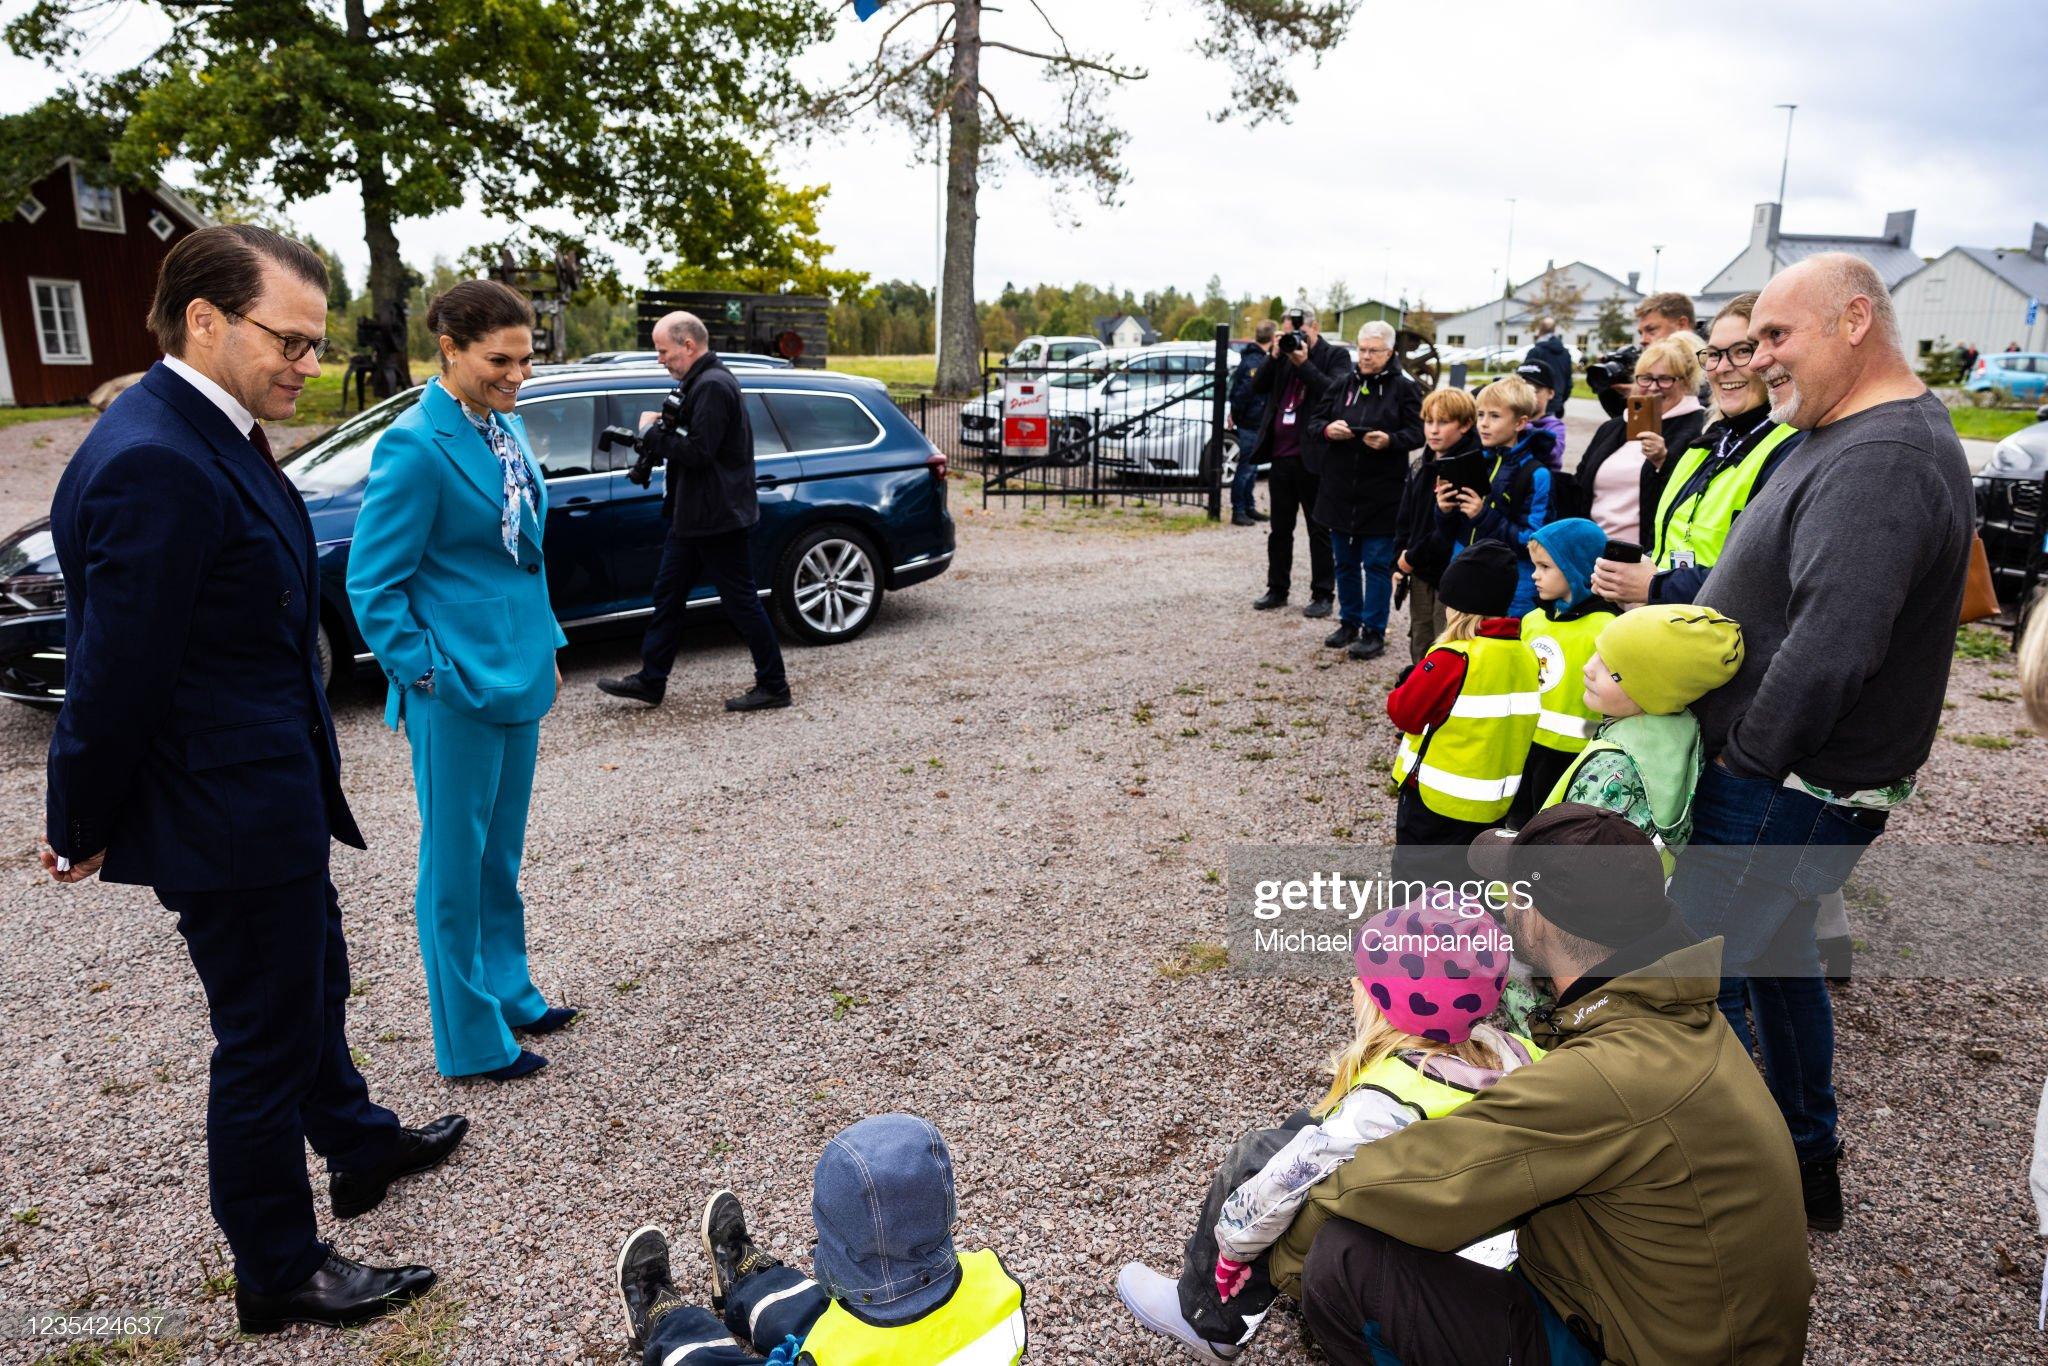 Swedish Royals Visit Gavleborg County : News Photo